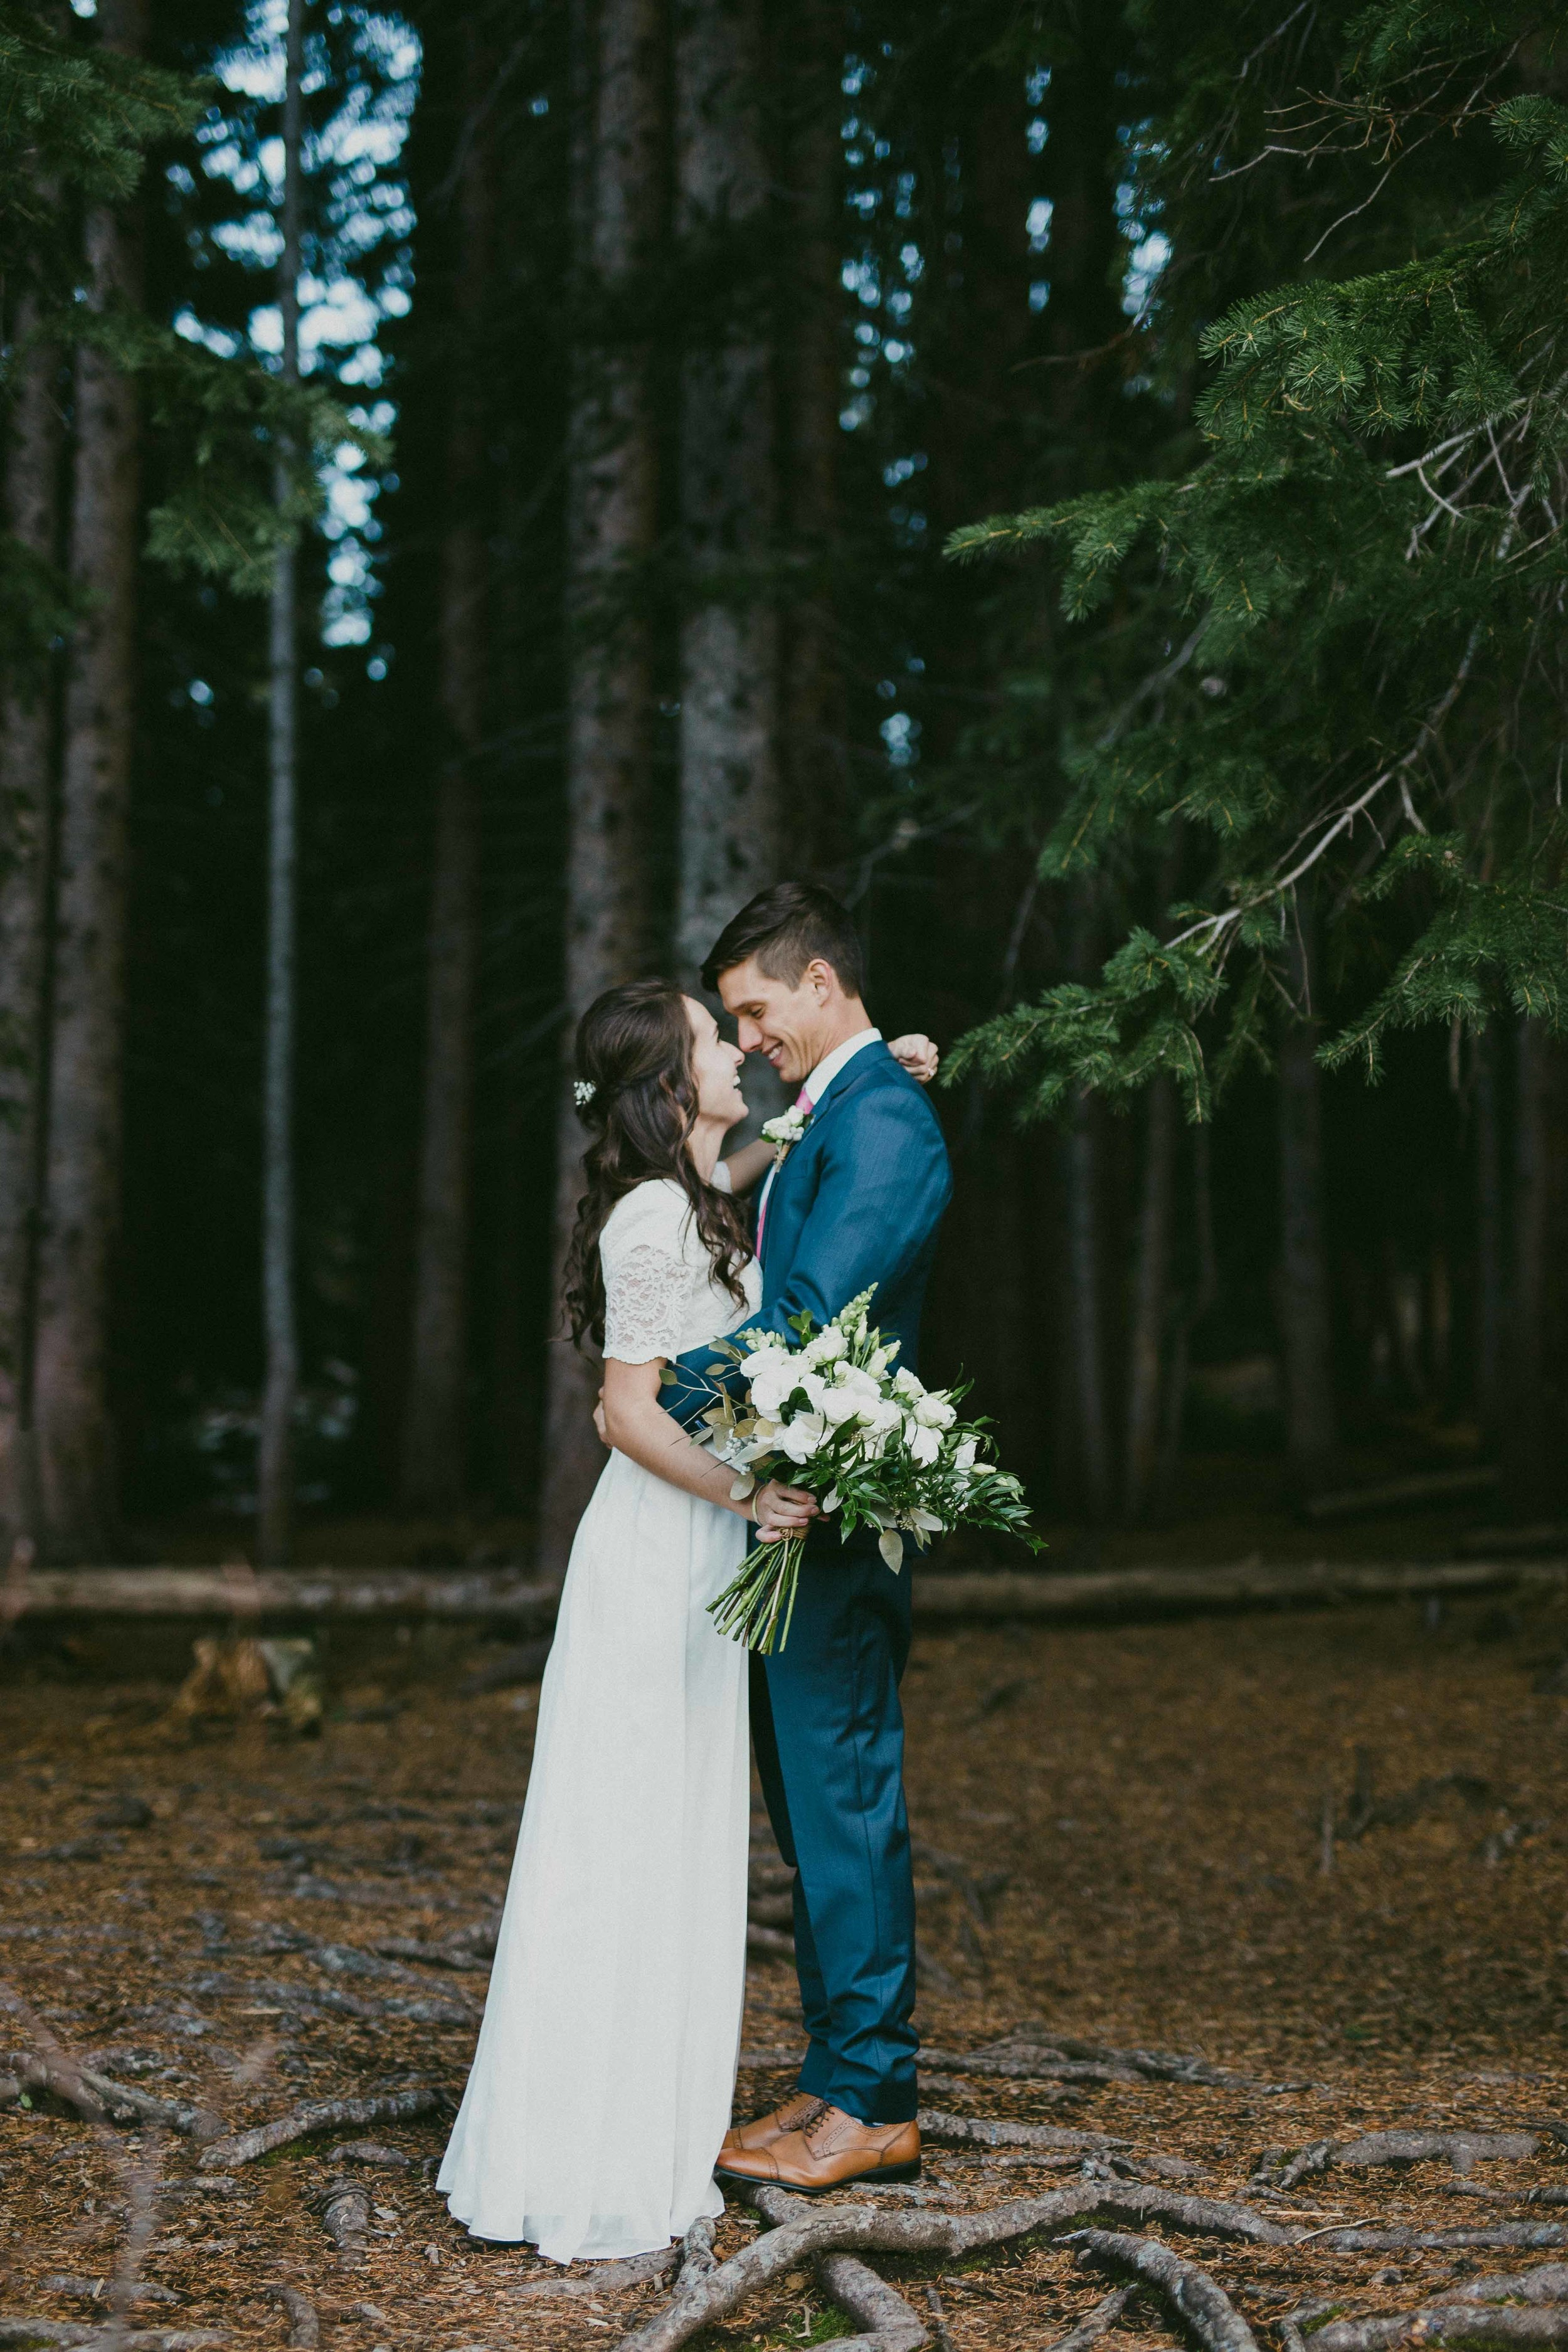 Salt-Lake-City-Wedding-Photographer-1-9.jpg